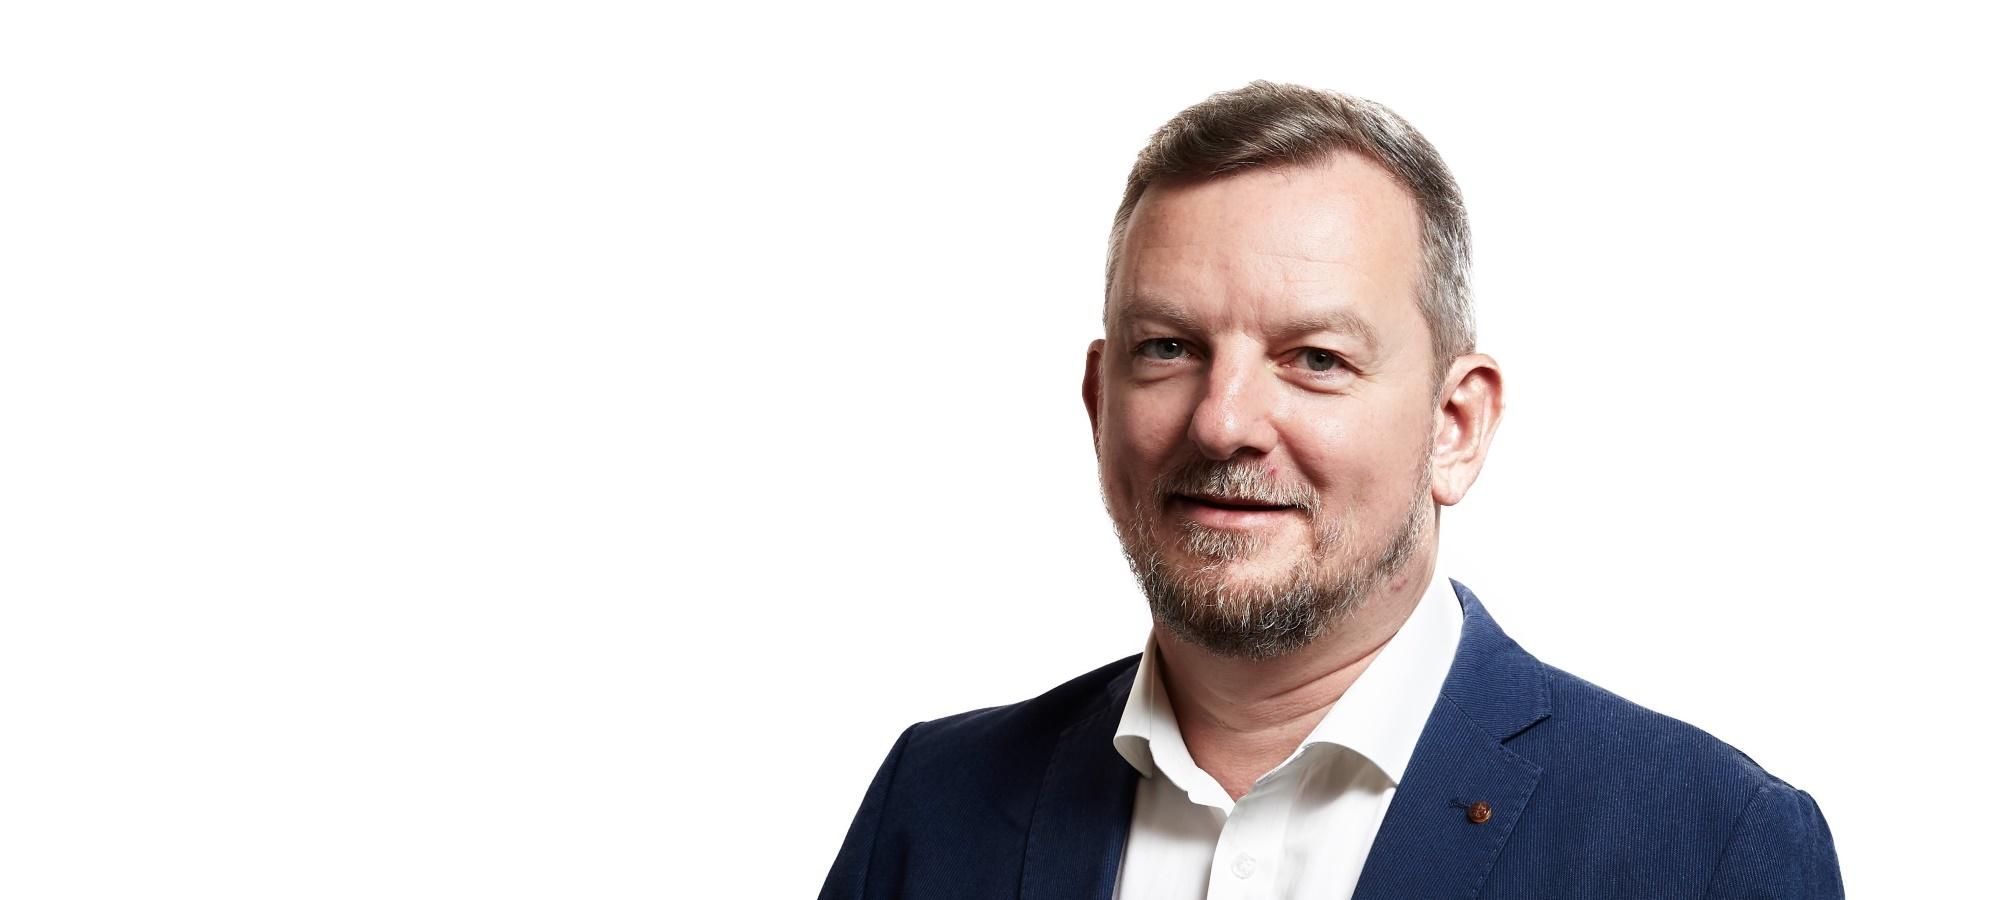 Julien Thomas, Principal Agile Consultant, Equinox IT Wellington